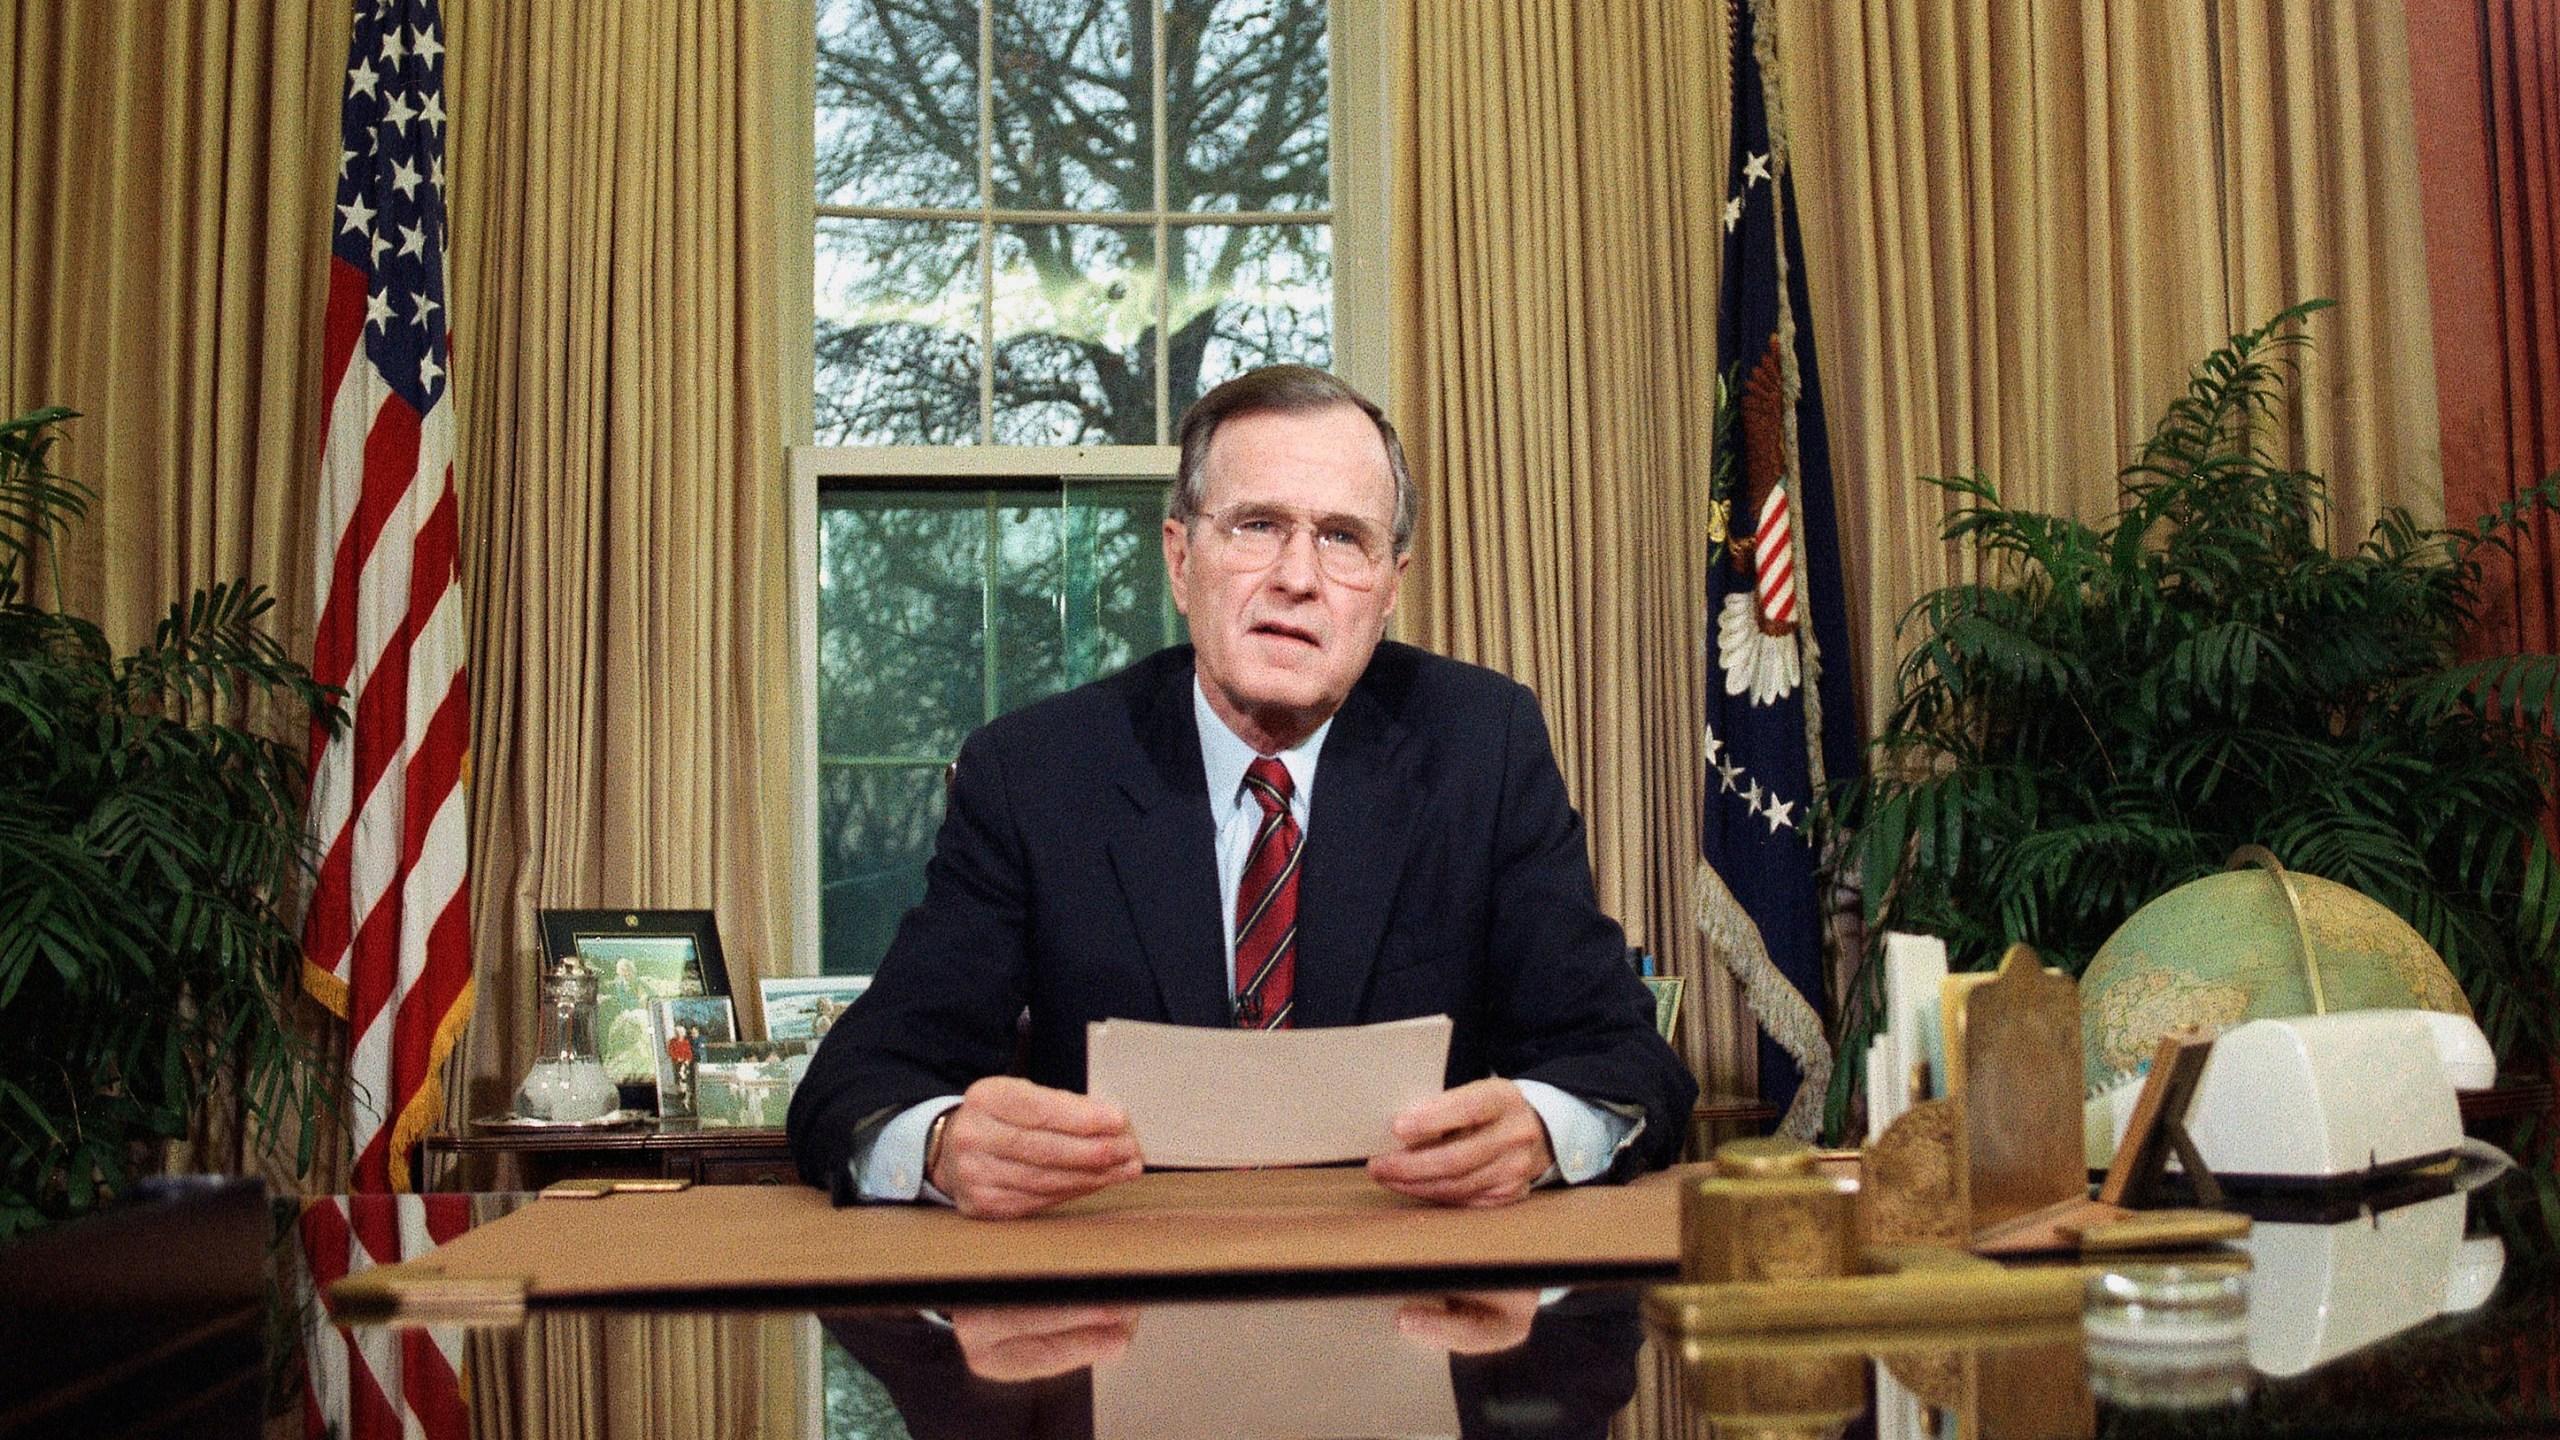 George_HW_Bush_Birthday_35786-159532.jpg65324623